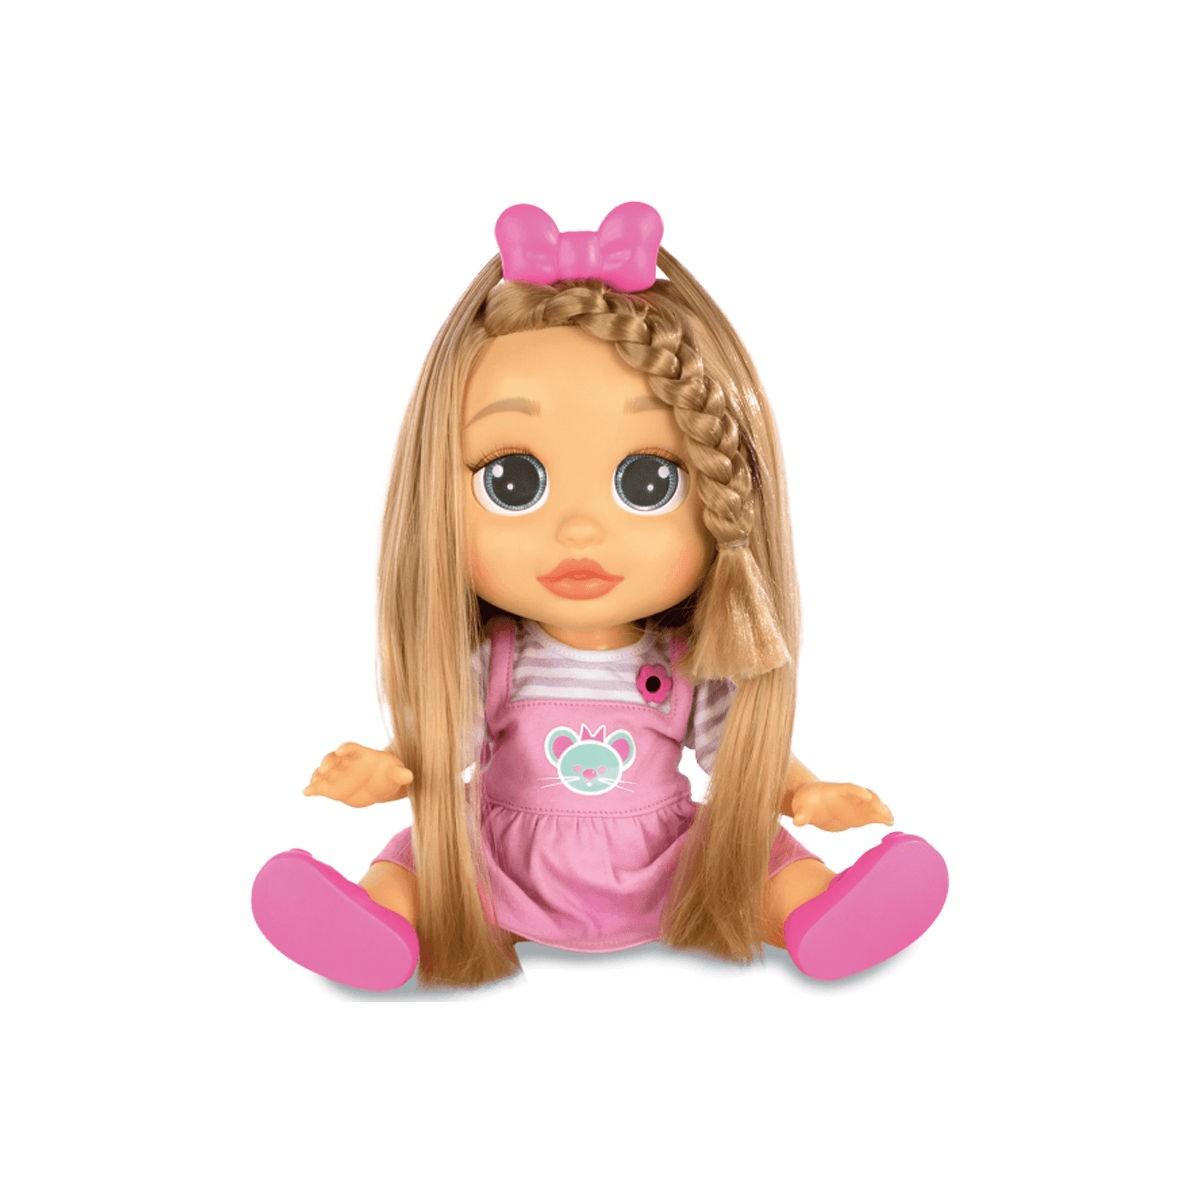 Boneca Baby Wow Mia Cabelo Cresce de Verdade 9 Acessórios